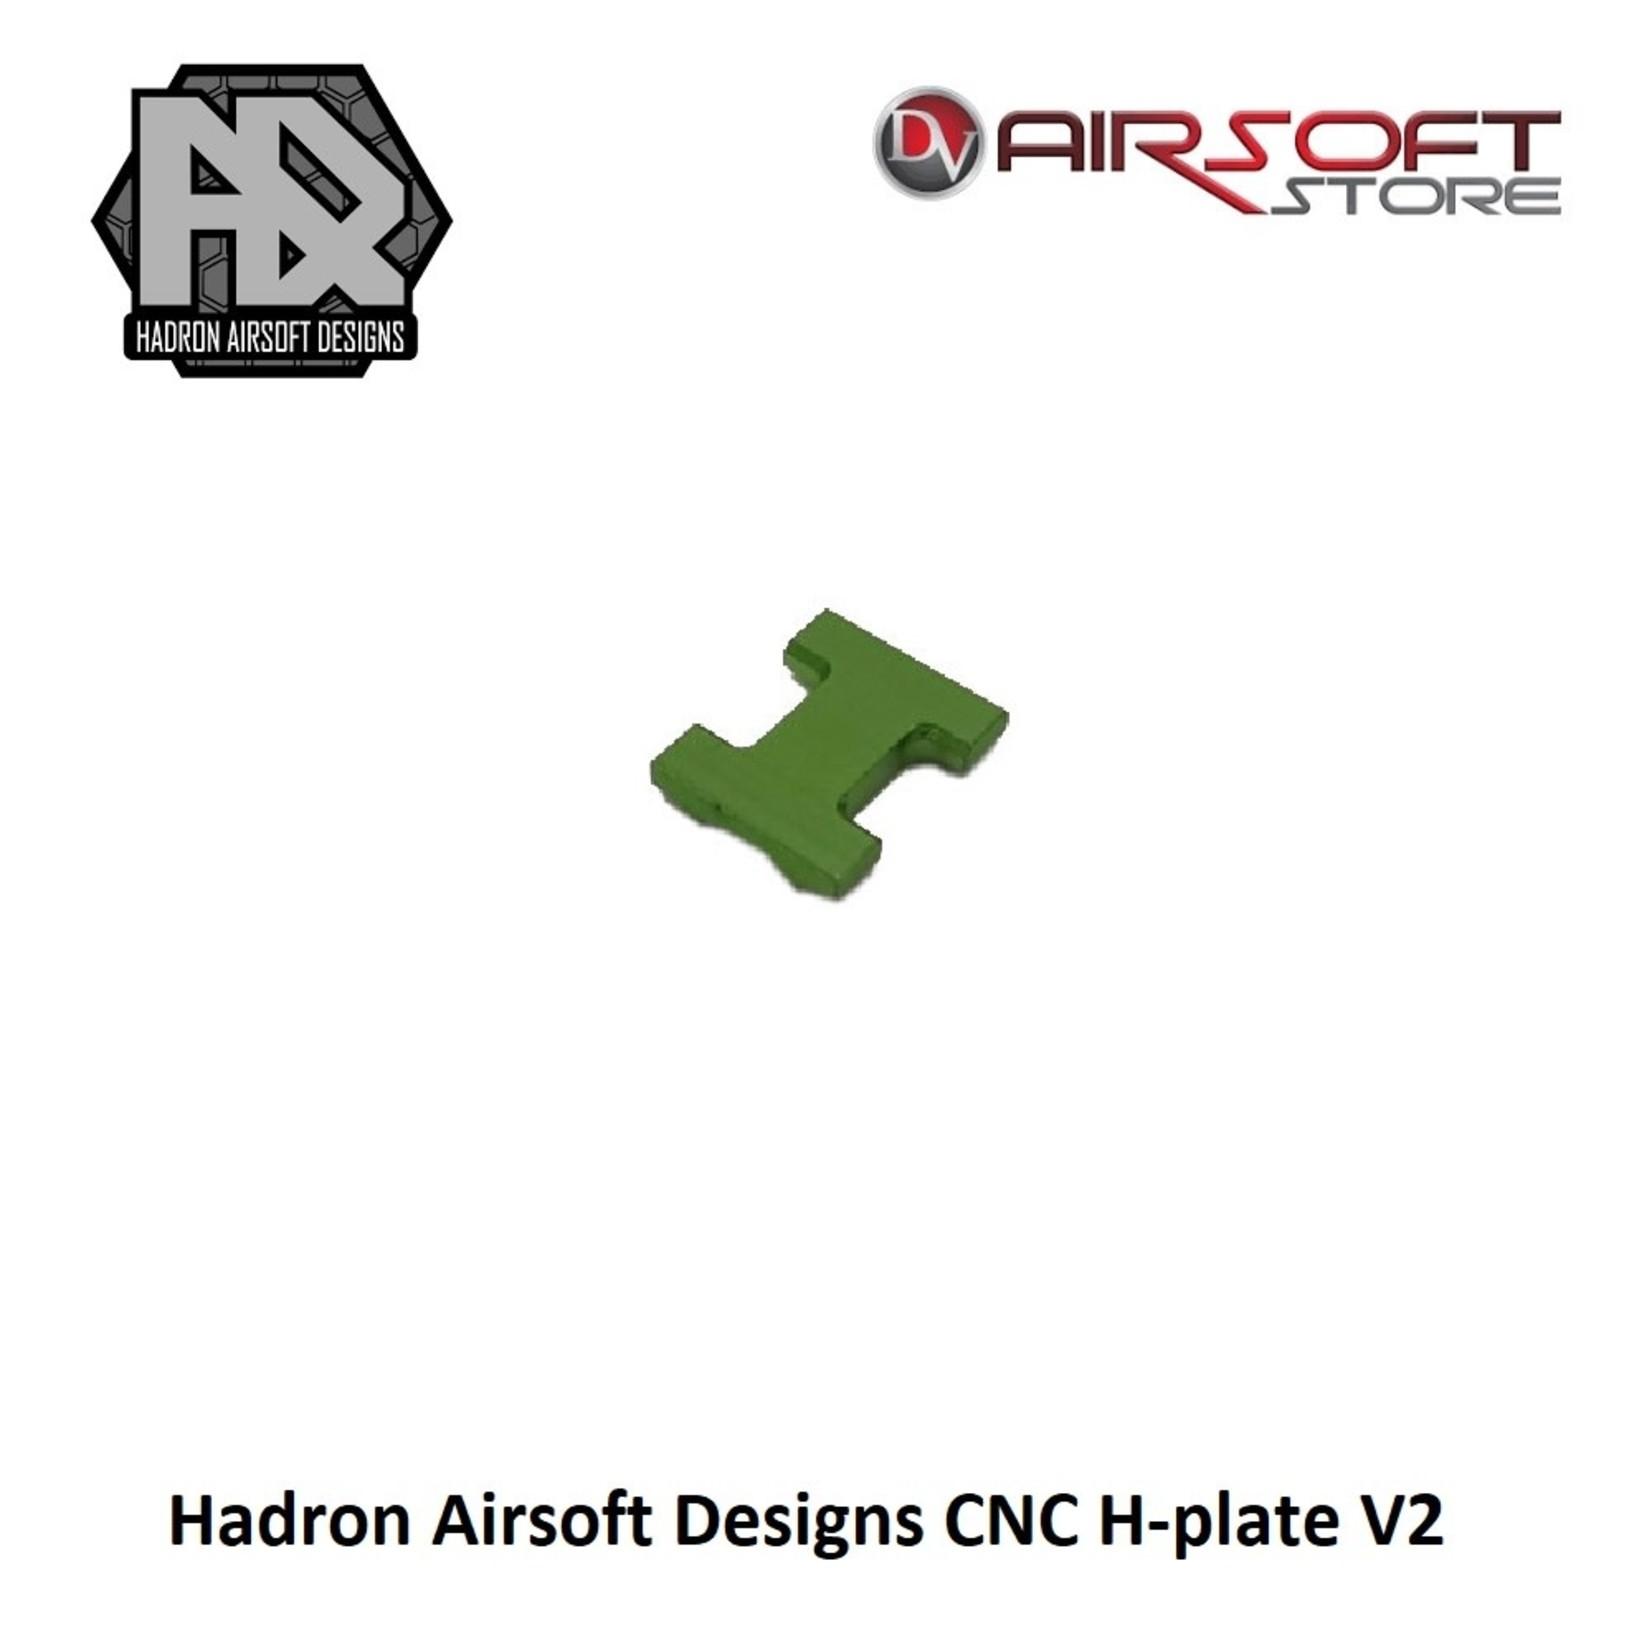 Hadron Airsoft Designs CNC H-plate V2